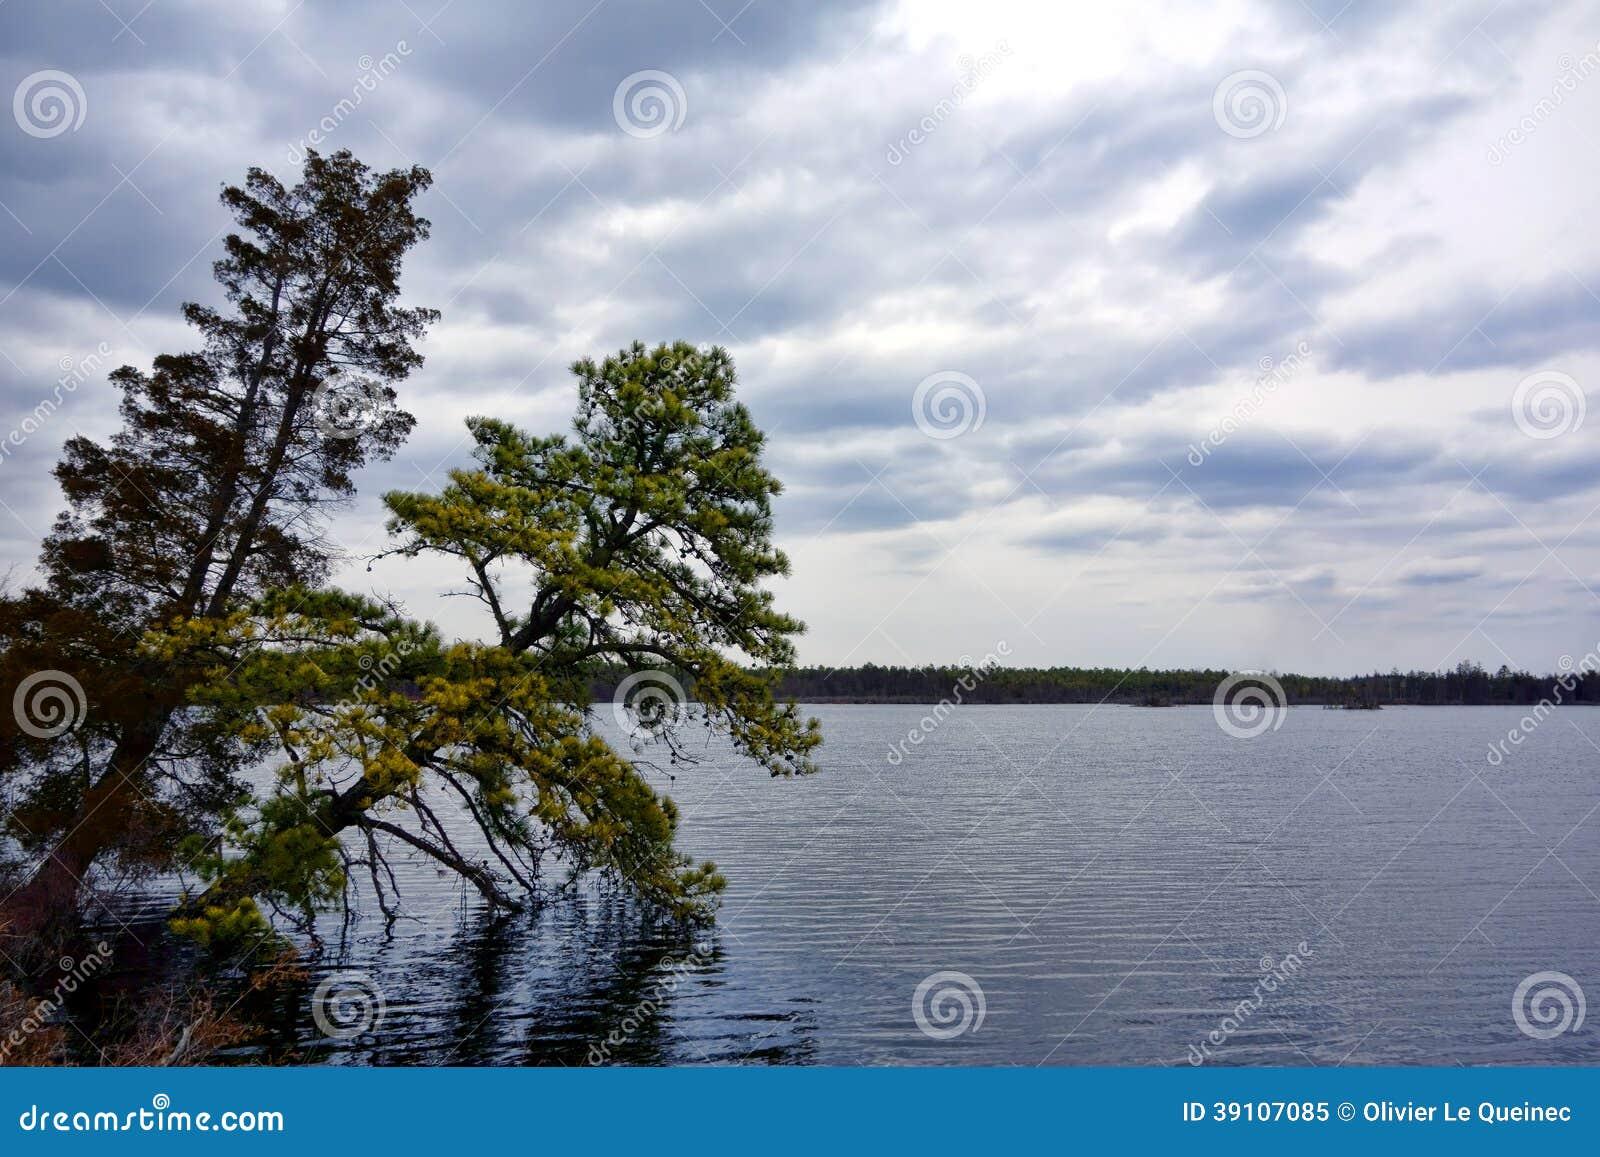 New Jersey Pine Barrens Pinelands National Reserve